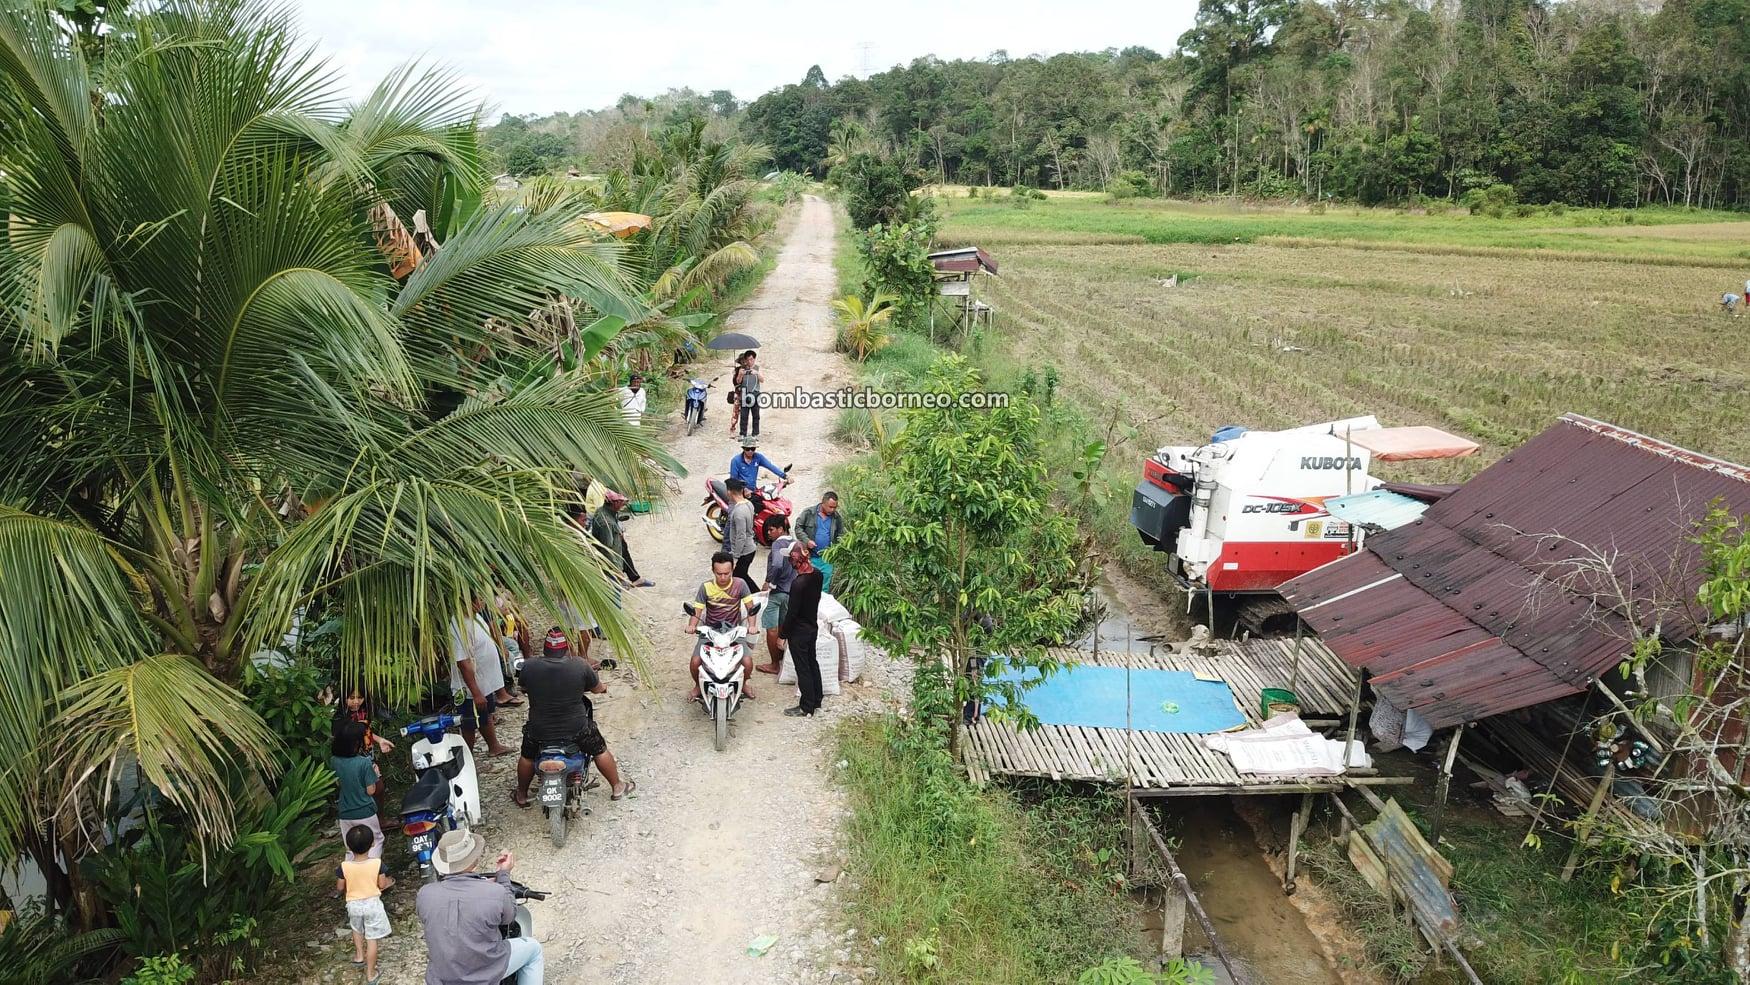 native village, Kubota Combine Harvester, Paddy Fields, Paddy Farming, Paddy Harvesting, Sawah Padi, dayak bidayuh, objek wisata, Tourism, travel guide, travel locally, Trans Borneo, 马来西亚砂拉越, 西连稻米之乡, 比达友稻谷收割,